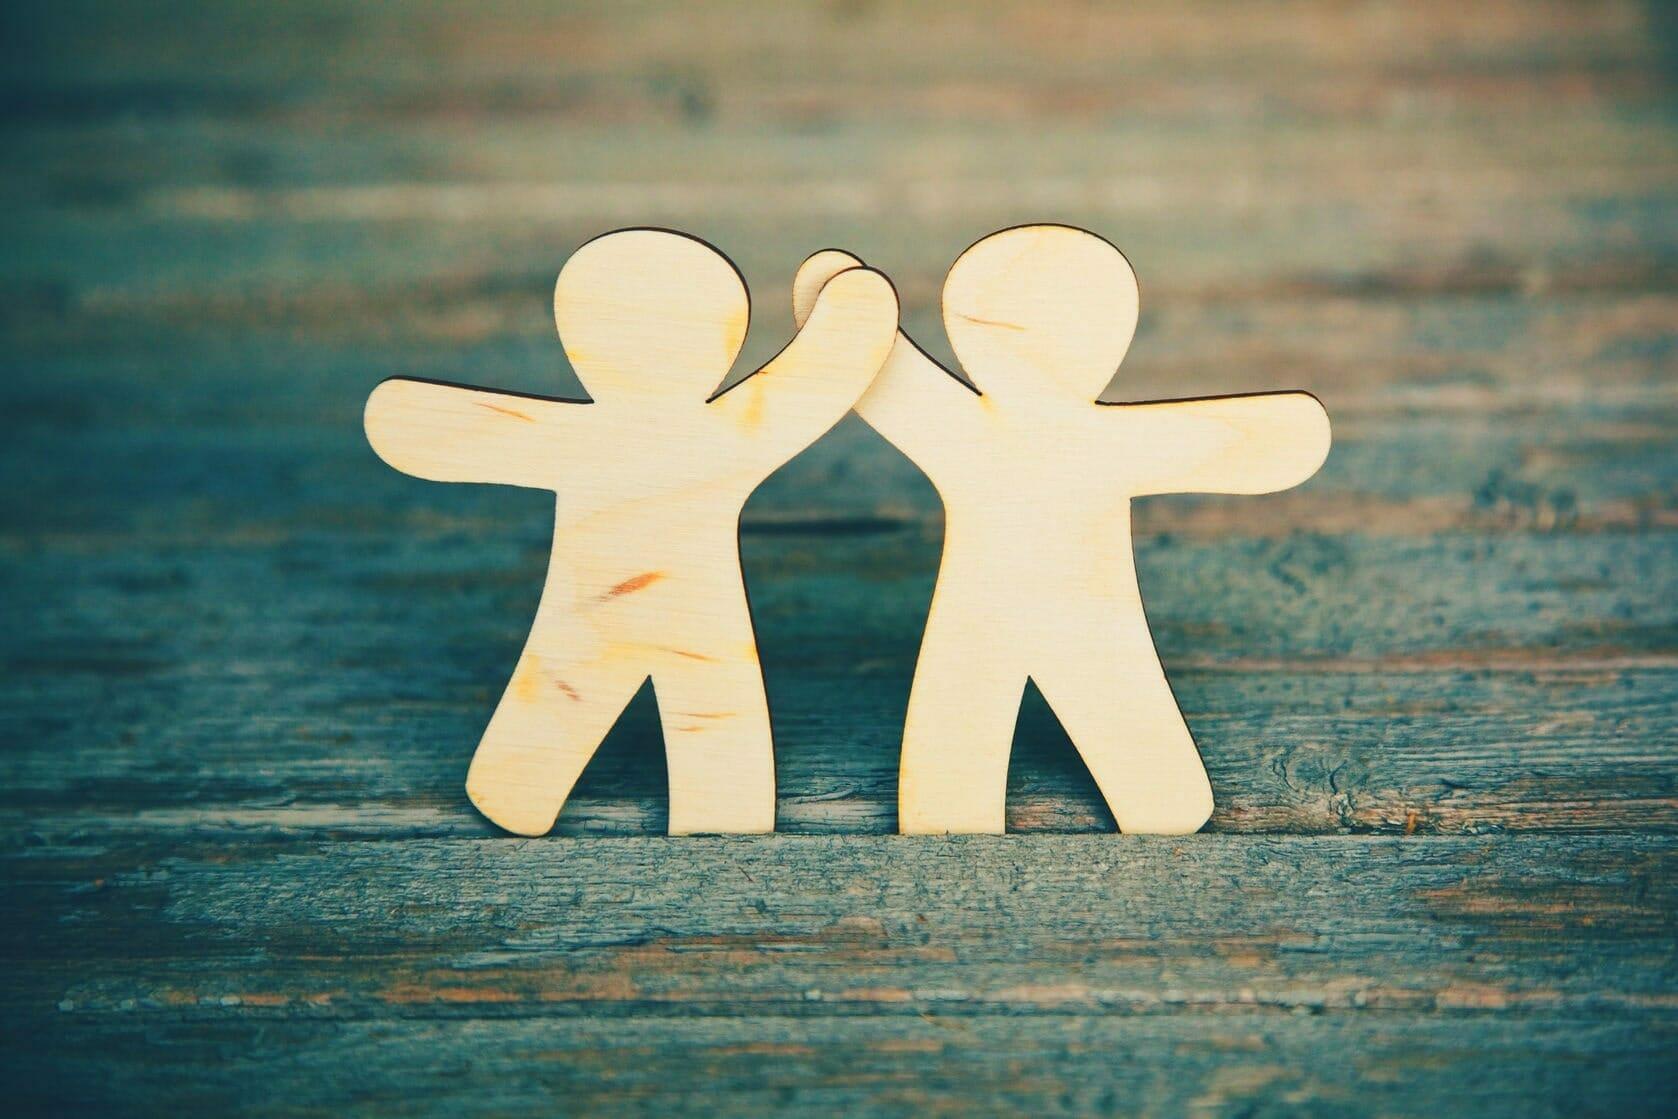 wooden little men holding hands on wooden boards background. symbol of friendship, love and teamwork